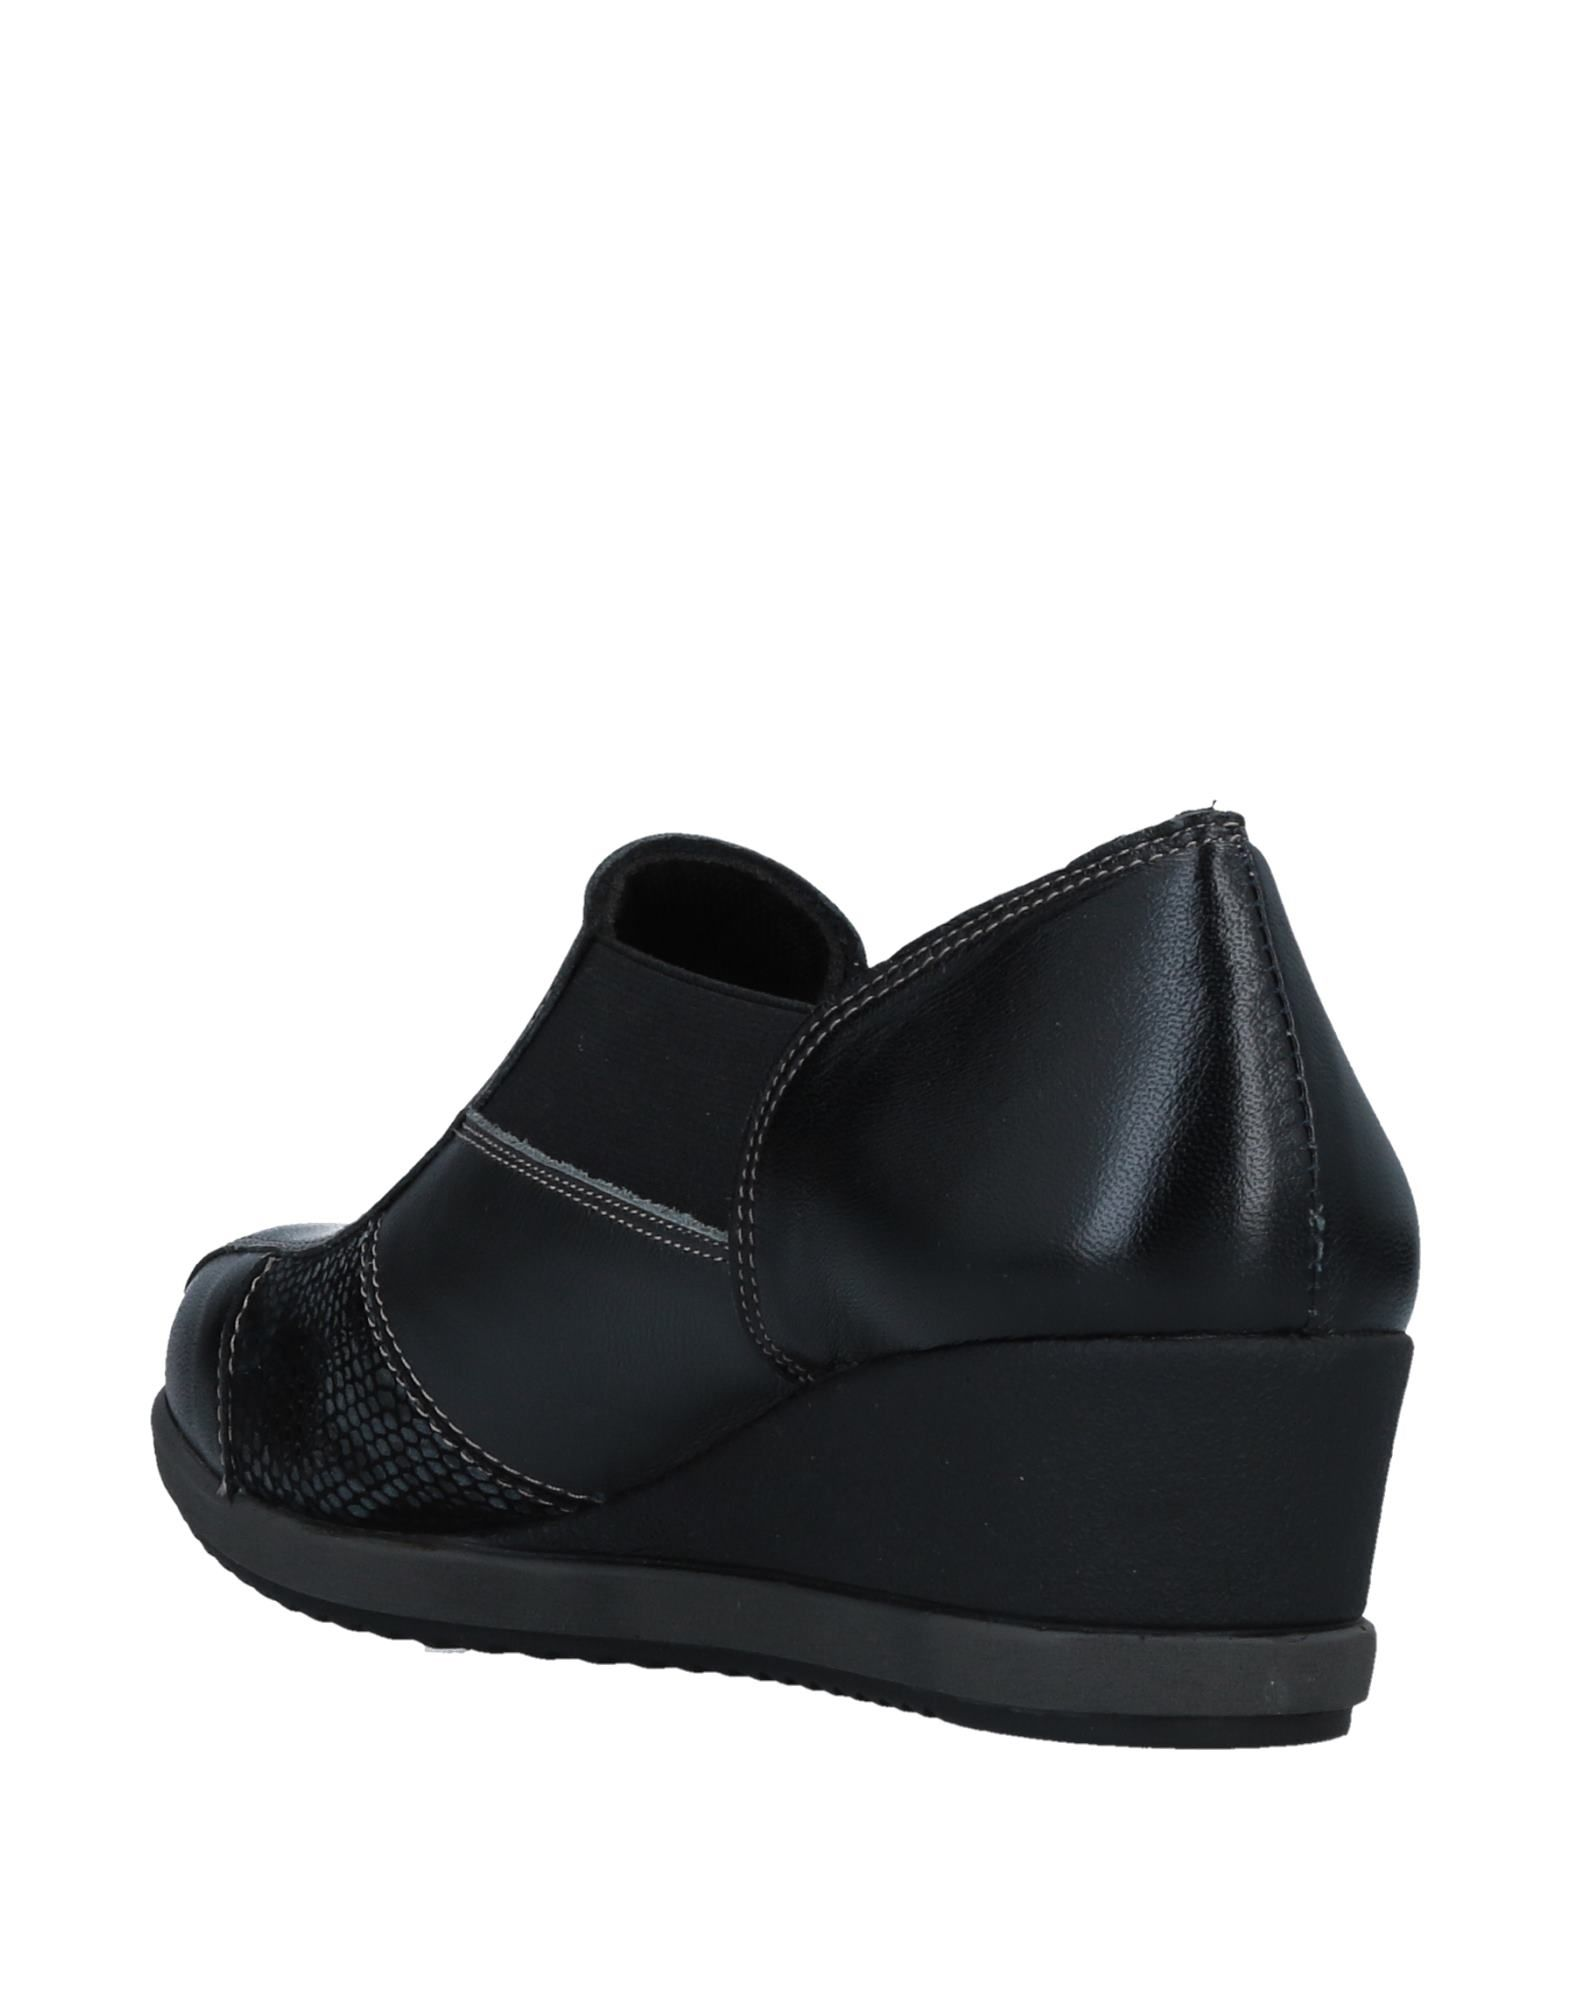 Cinzia 11507216KM Soft By Mauri Moda Mokassins Damen  11507216KM Cinzia Heiße Schuhe e842e1